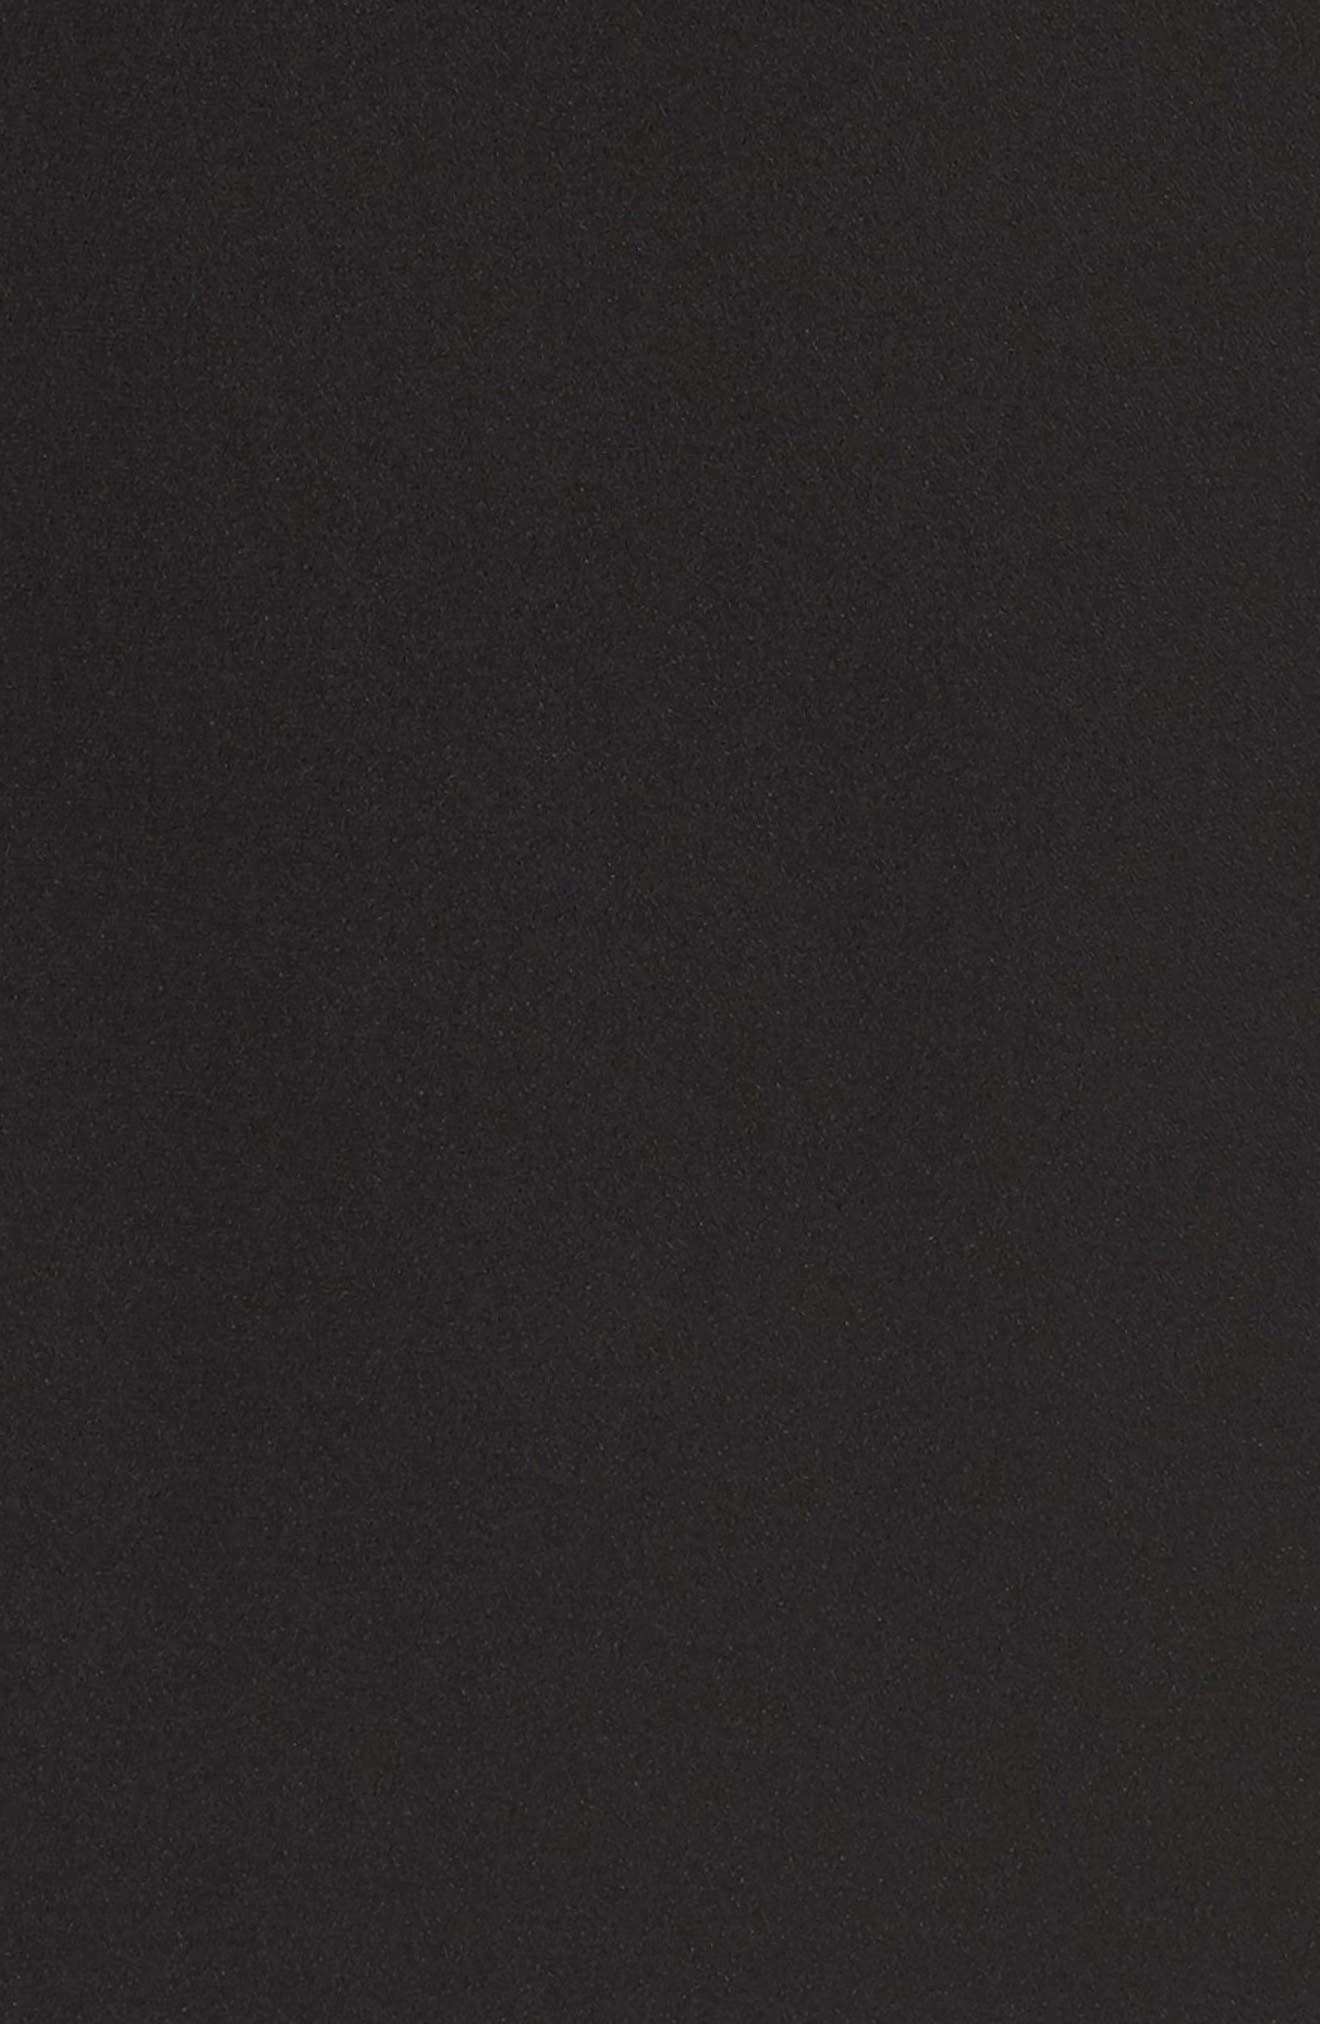 Lace Back Sheath Dress,                             Alternate thumbnail 5, color,                             001